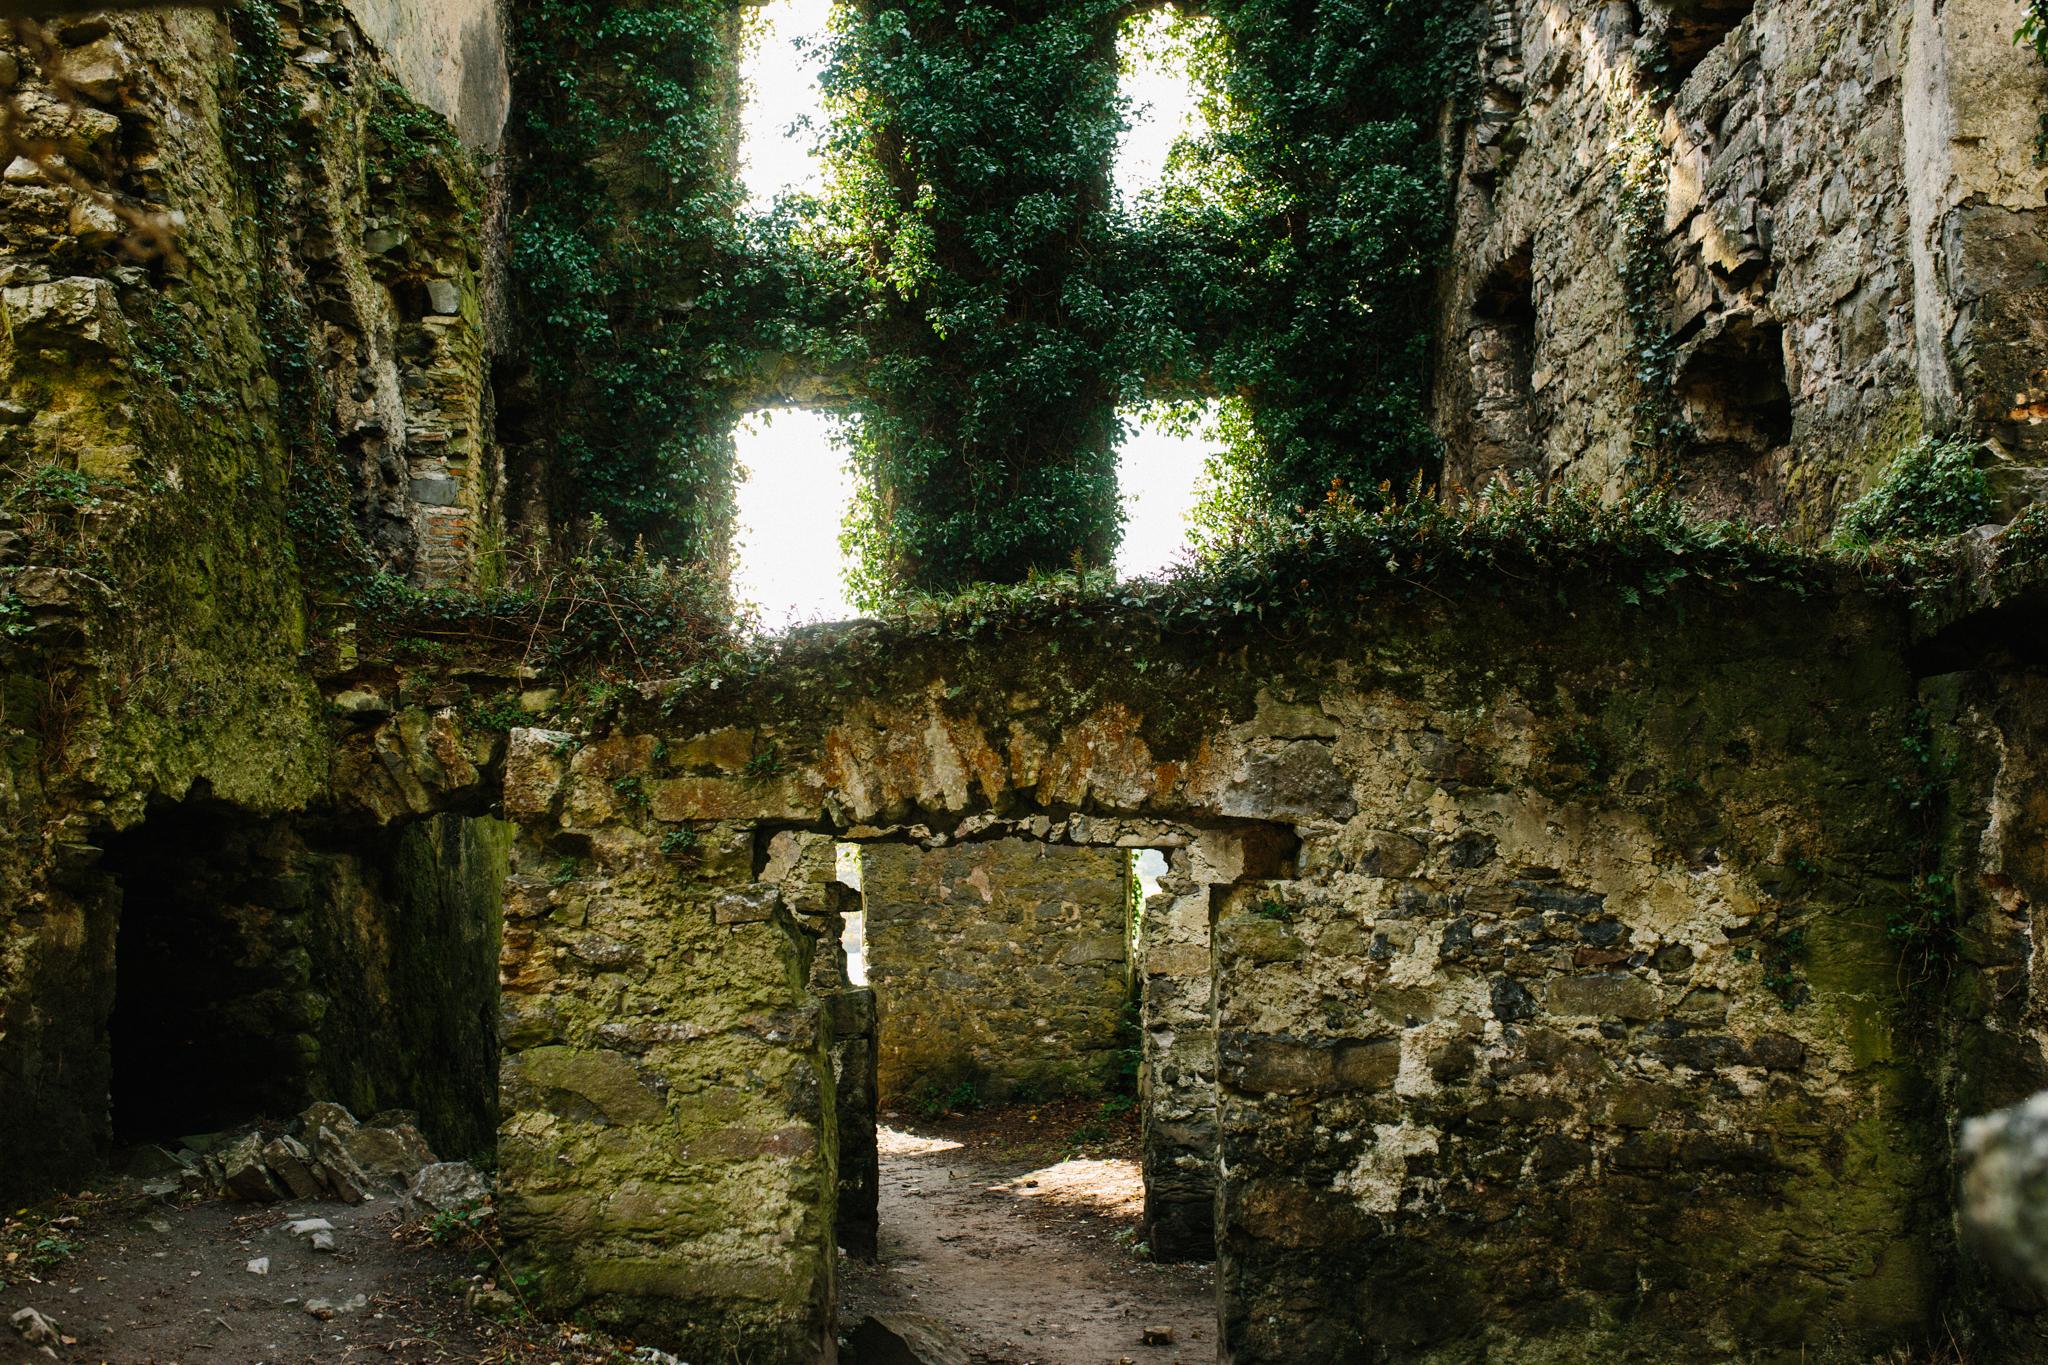 ireland_galway_dublin_rebecca_burt_photography-6.jpg